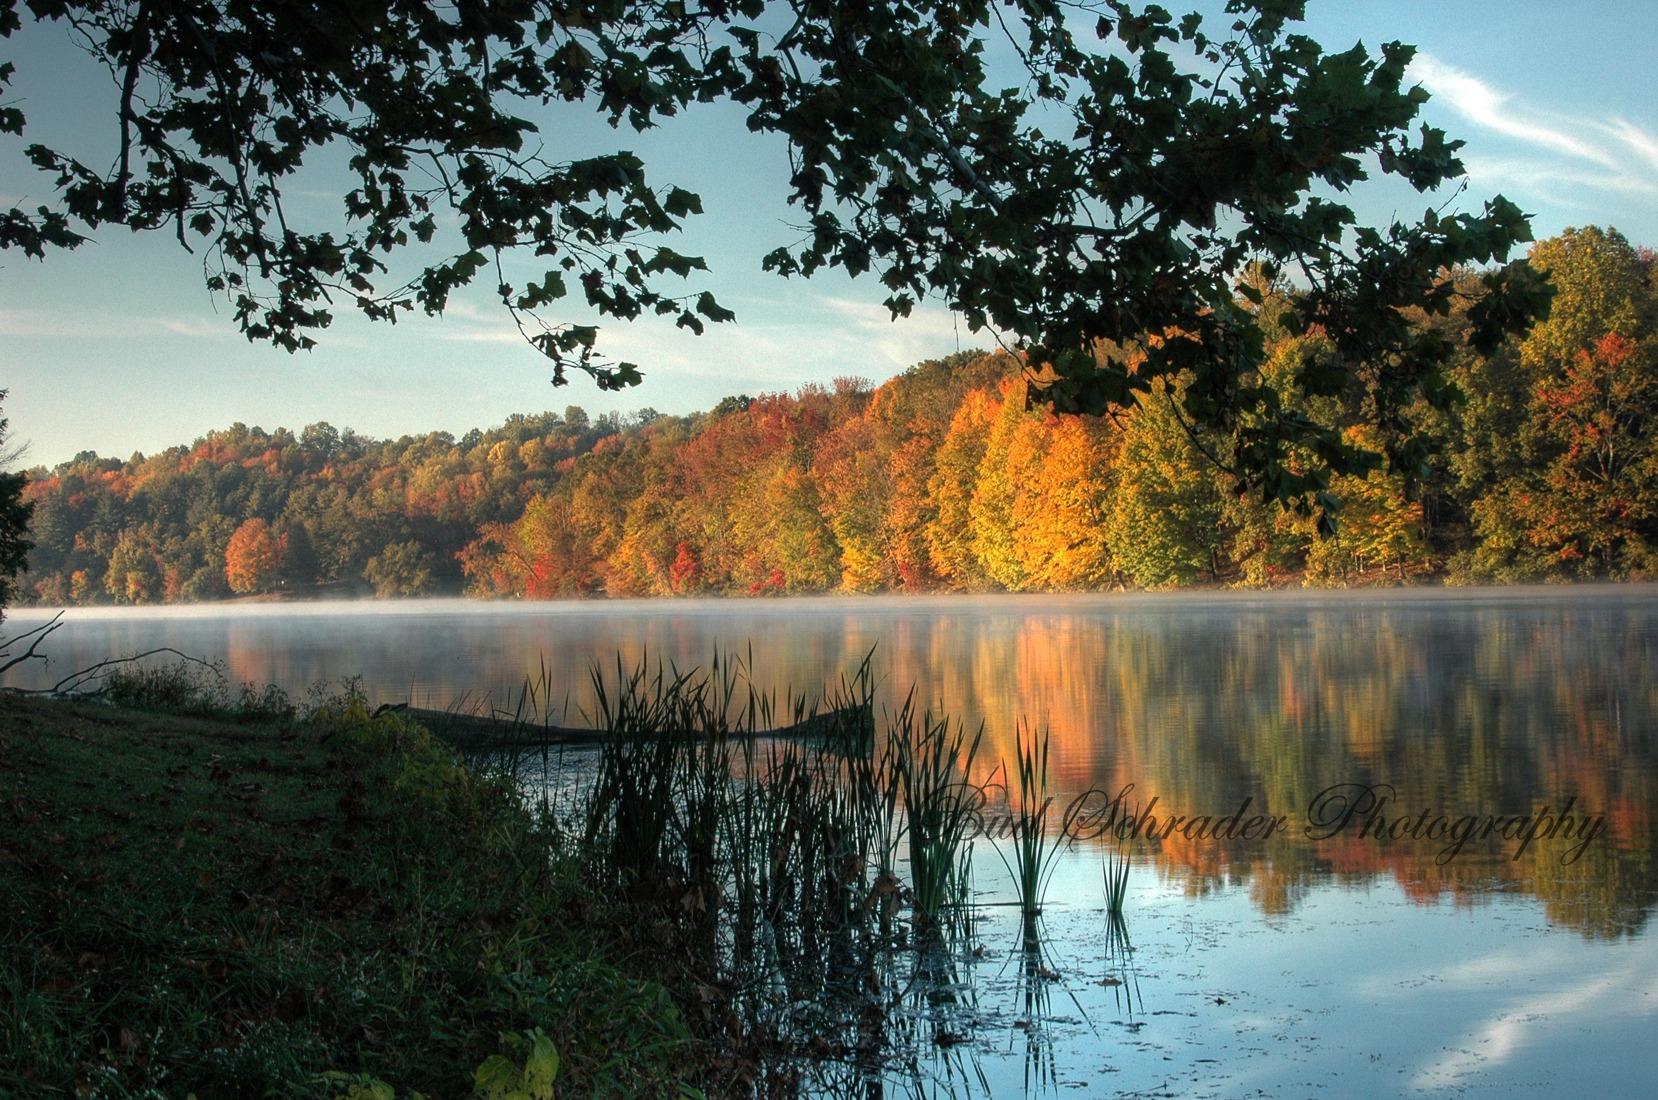 Lake Logan State Park, an Ohio park located near Lancaster